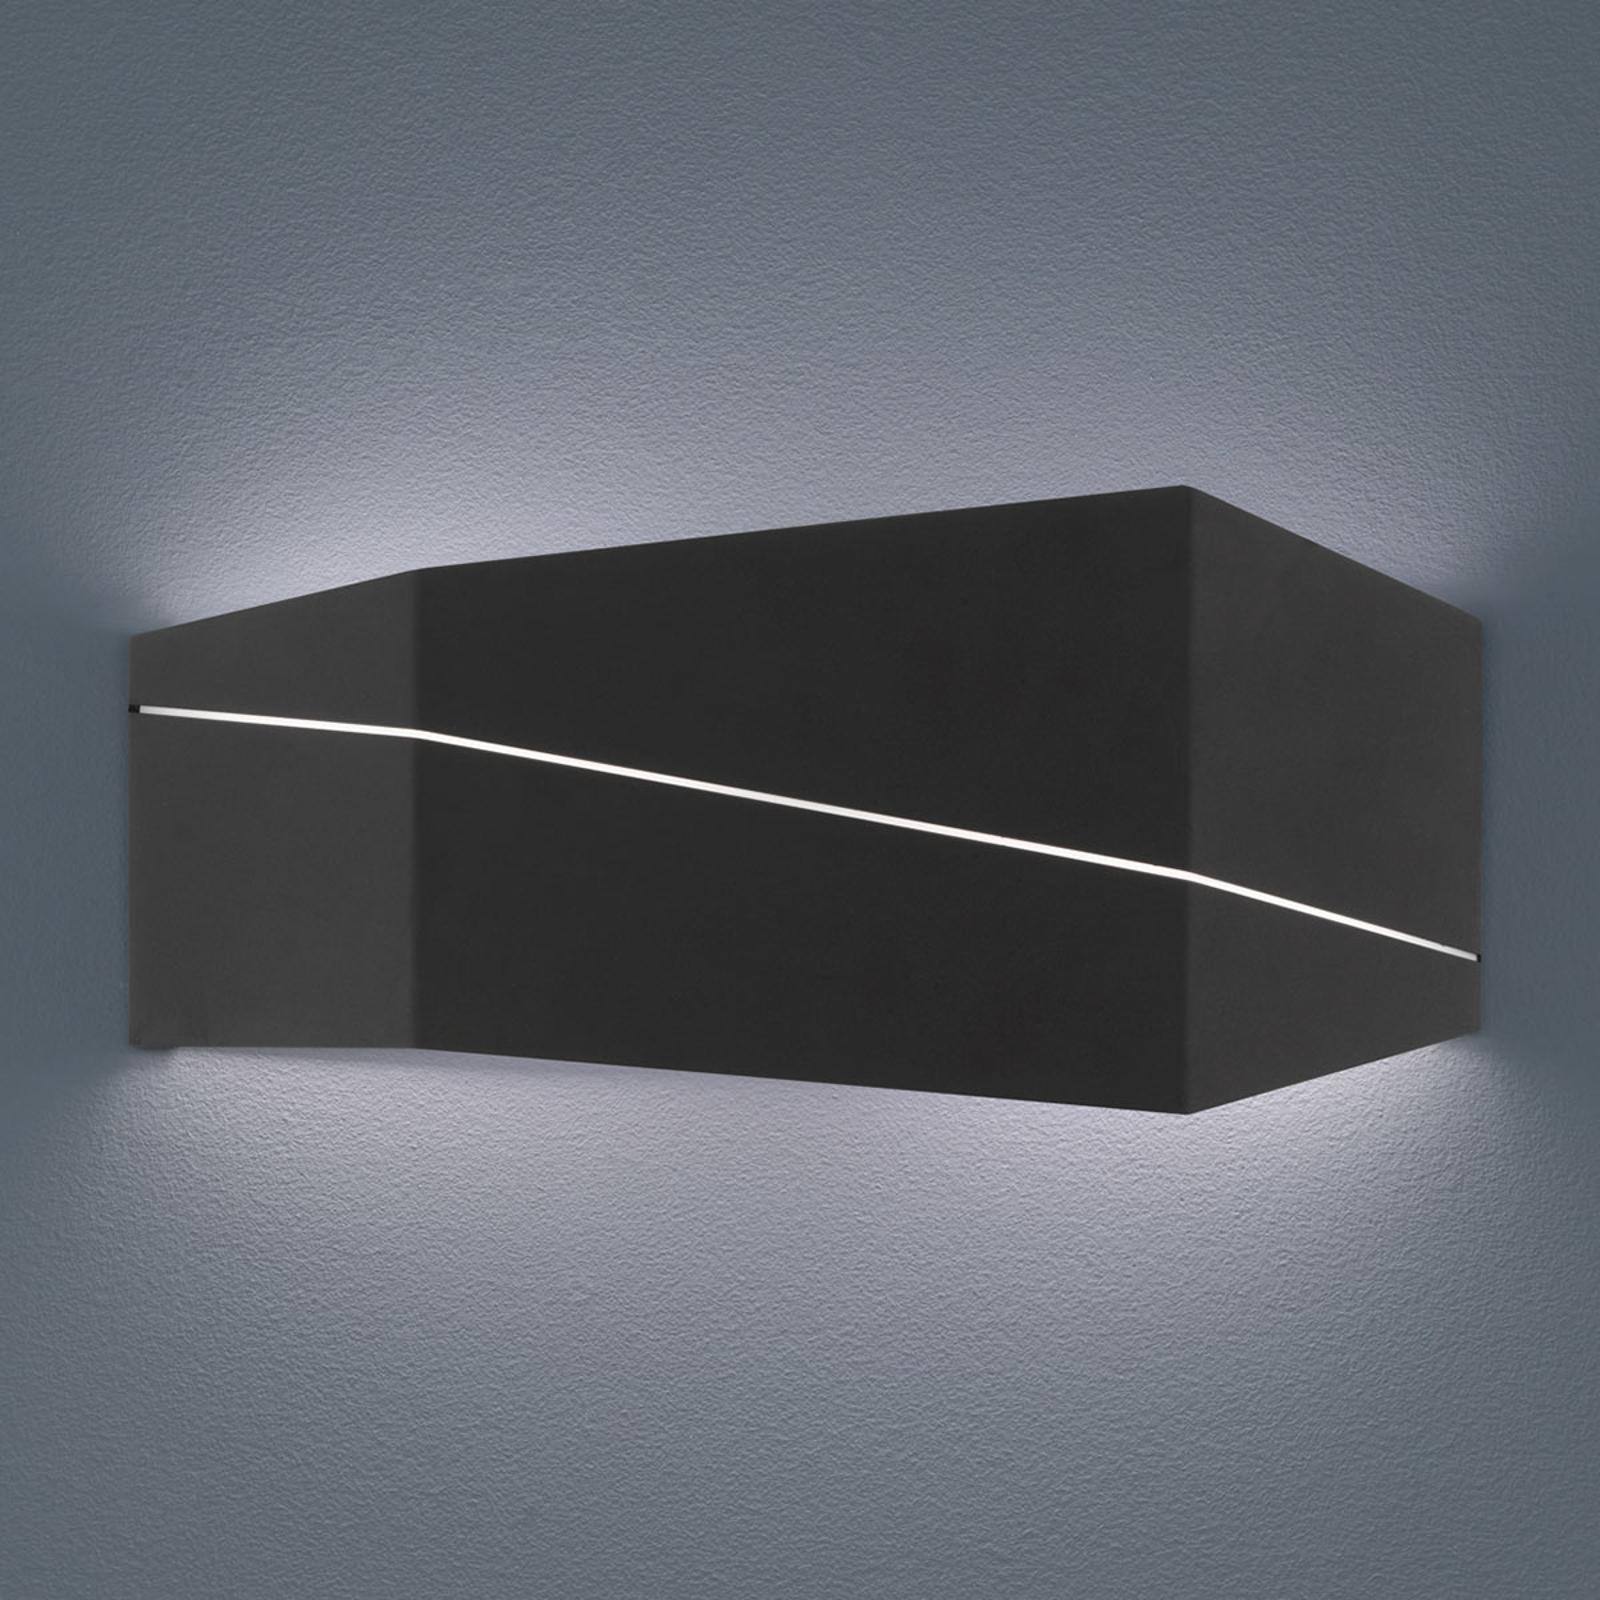 Zorro - moderne LED wandlamp, zwart mat, 40 cm